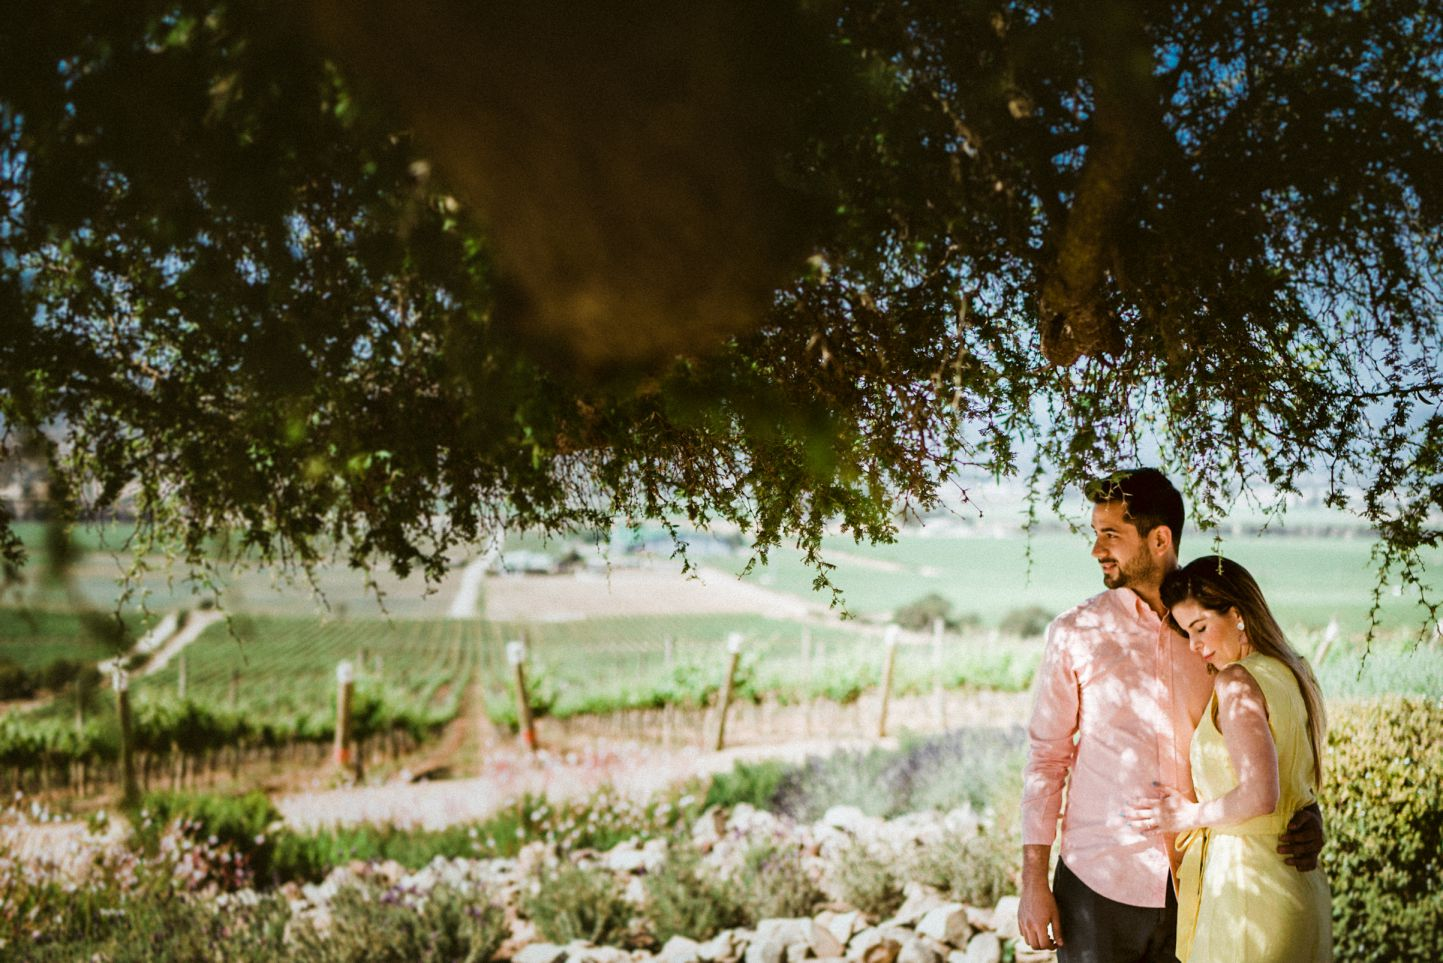 Viña casas del bosque - chile wineyard photoshot